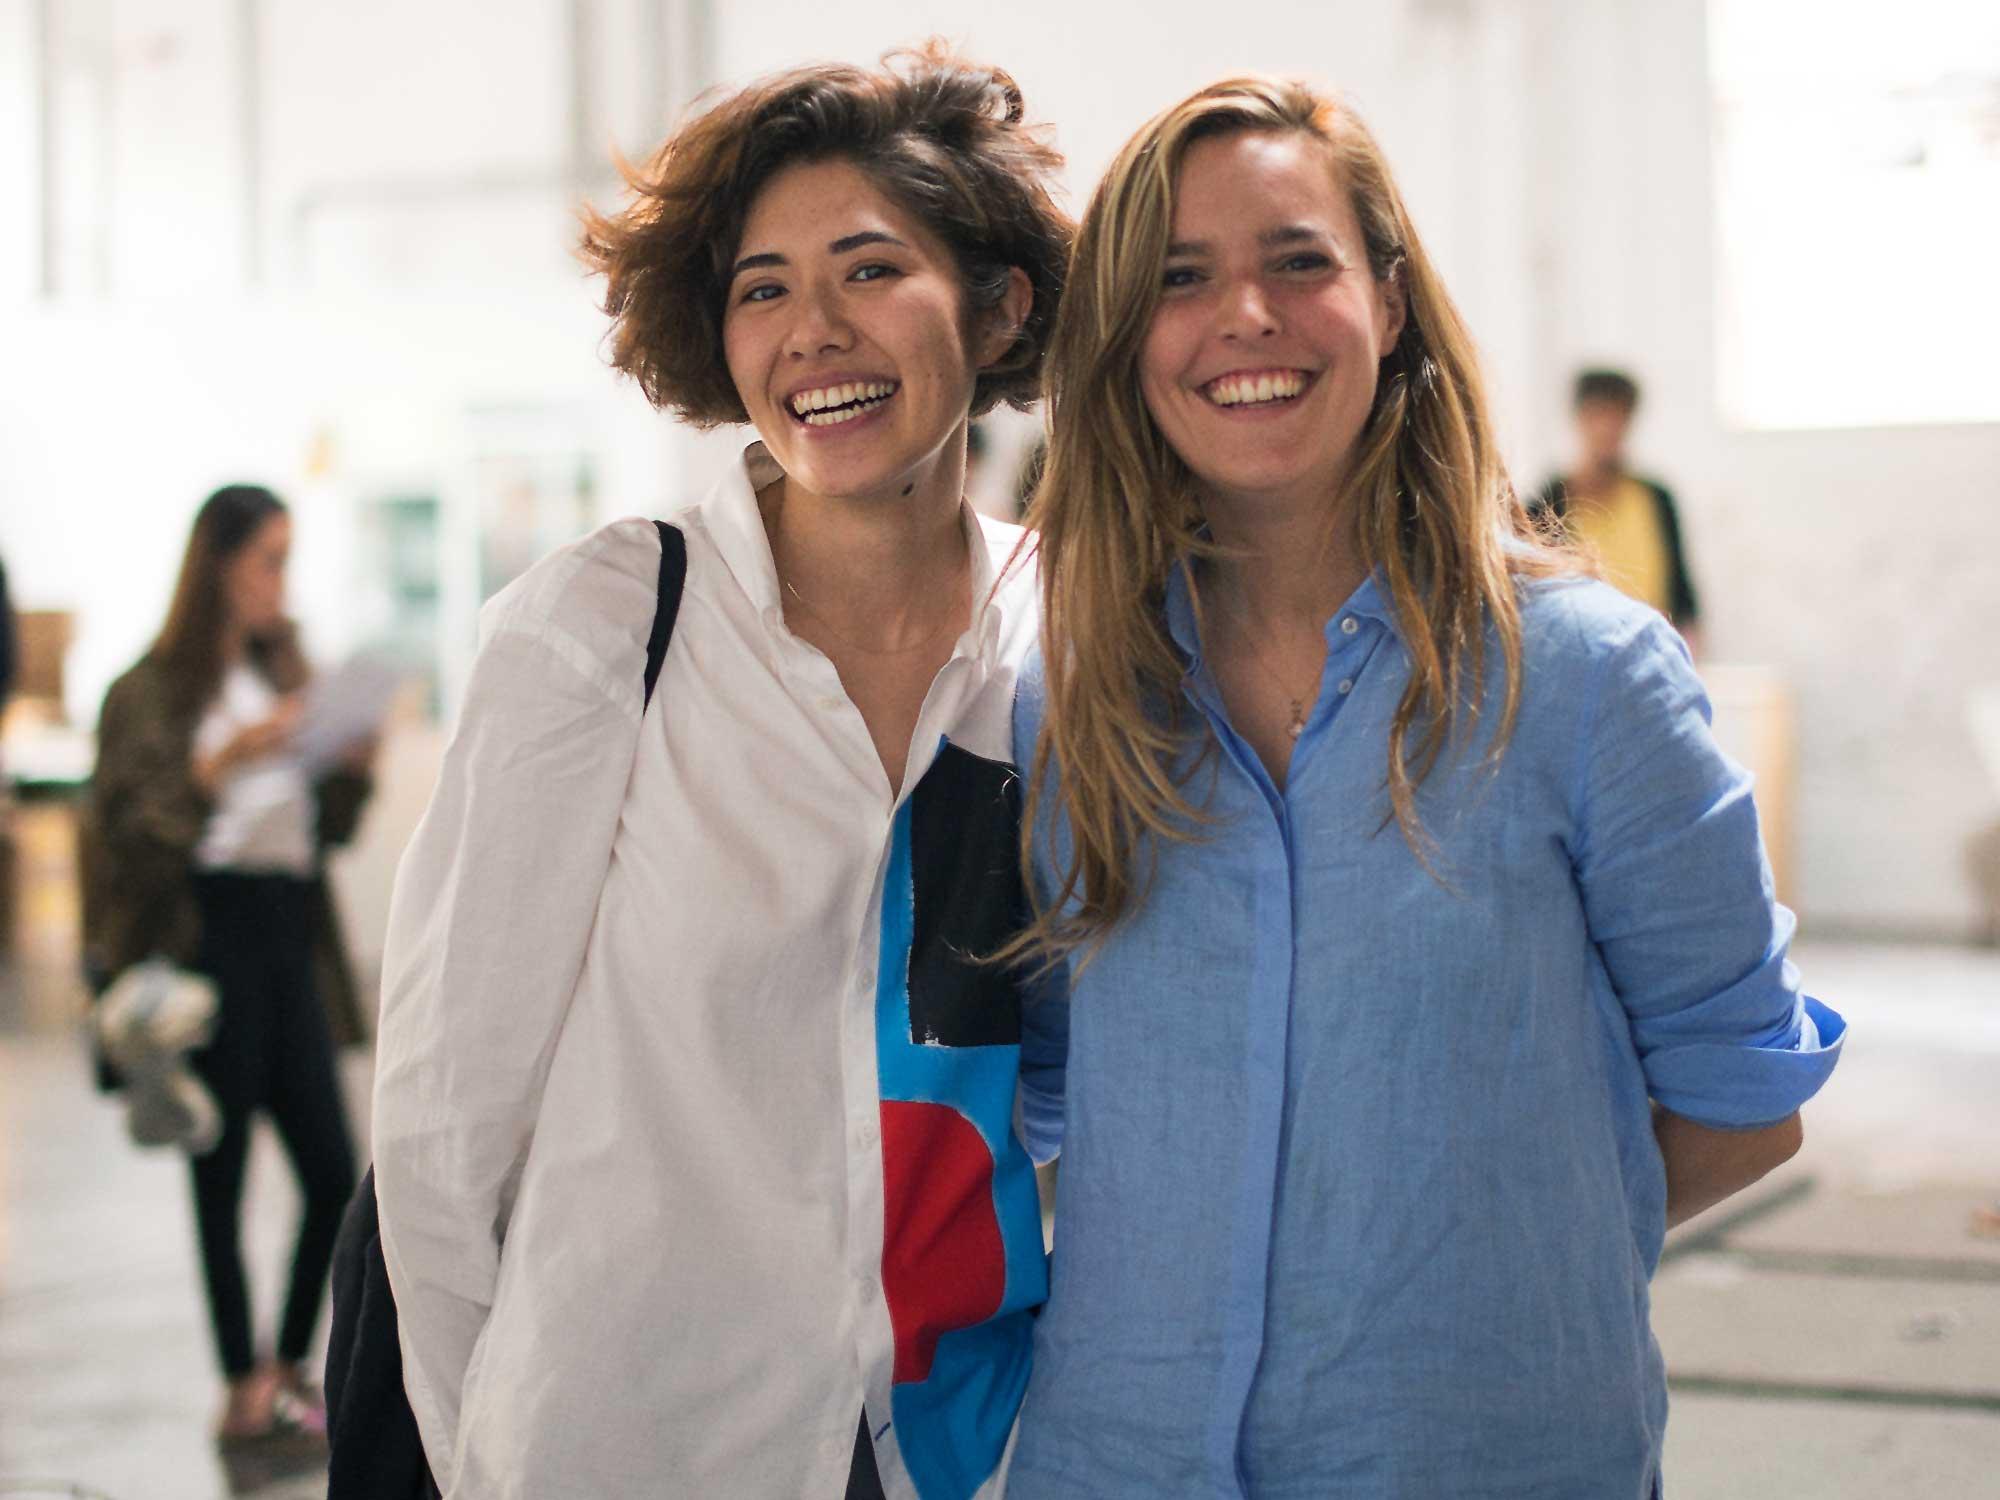 object_subject_exhibition_people_barcelona